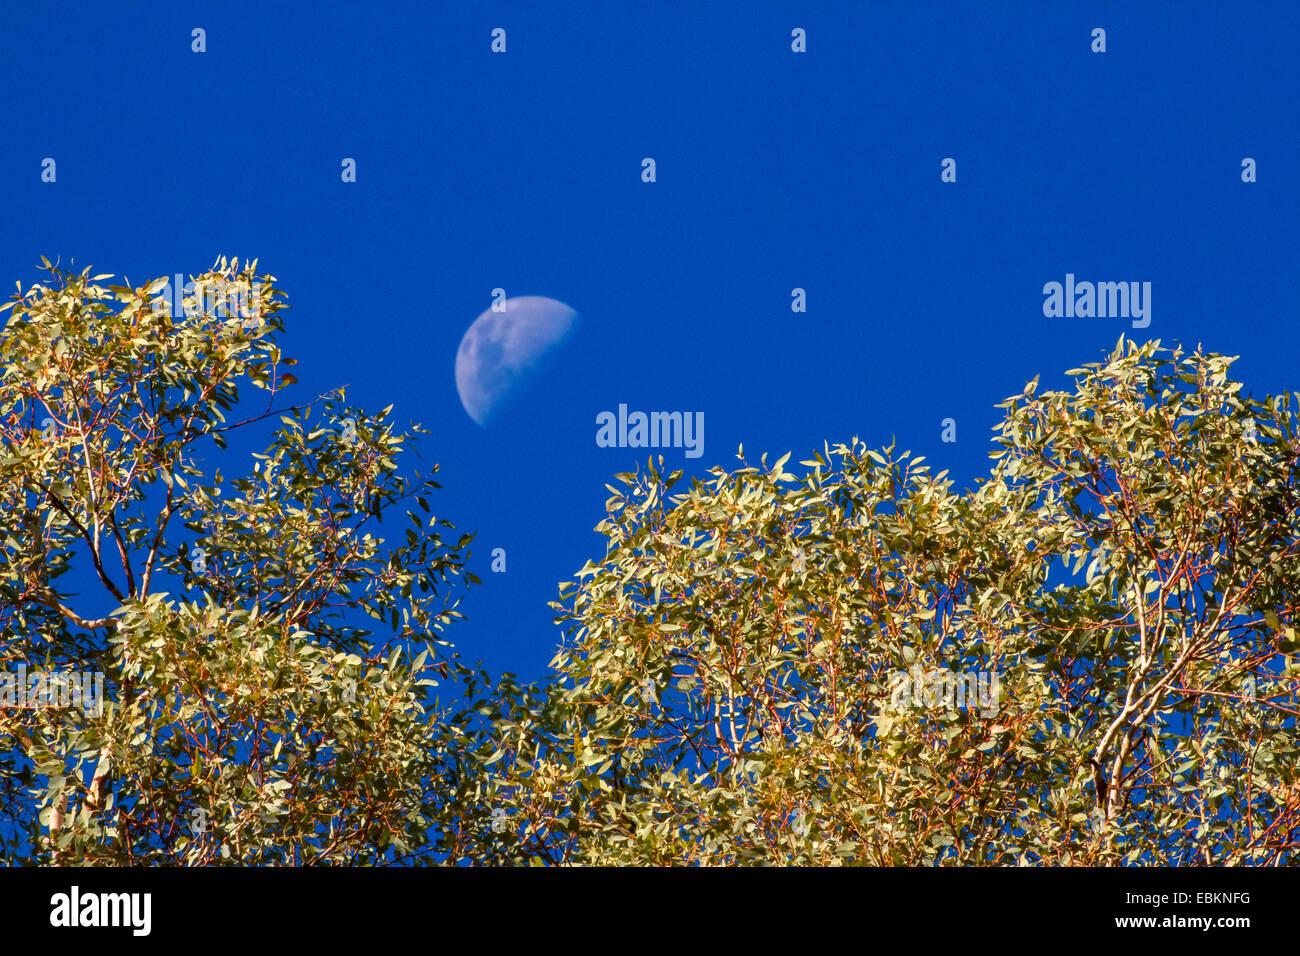 half moon over eucalyptus, Germany, Western Australia, Karijini National Park - Stock Image